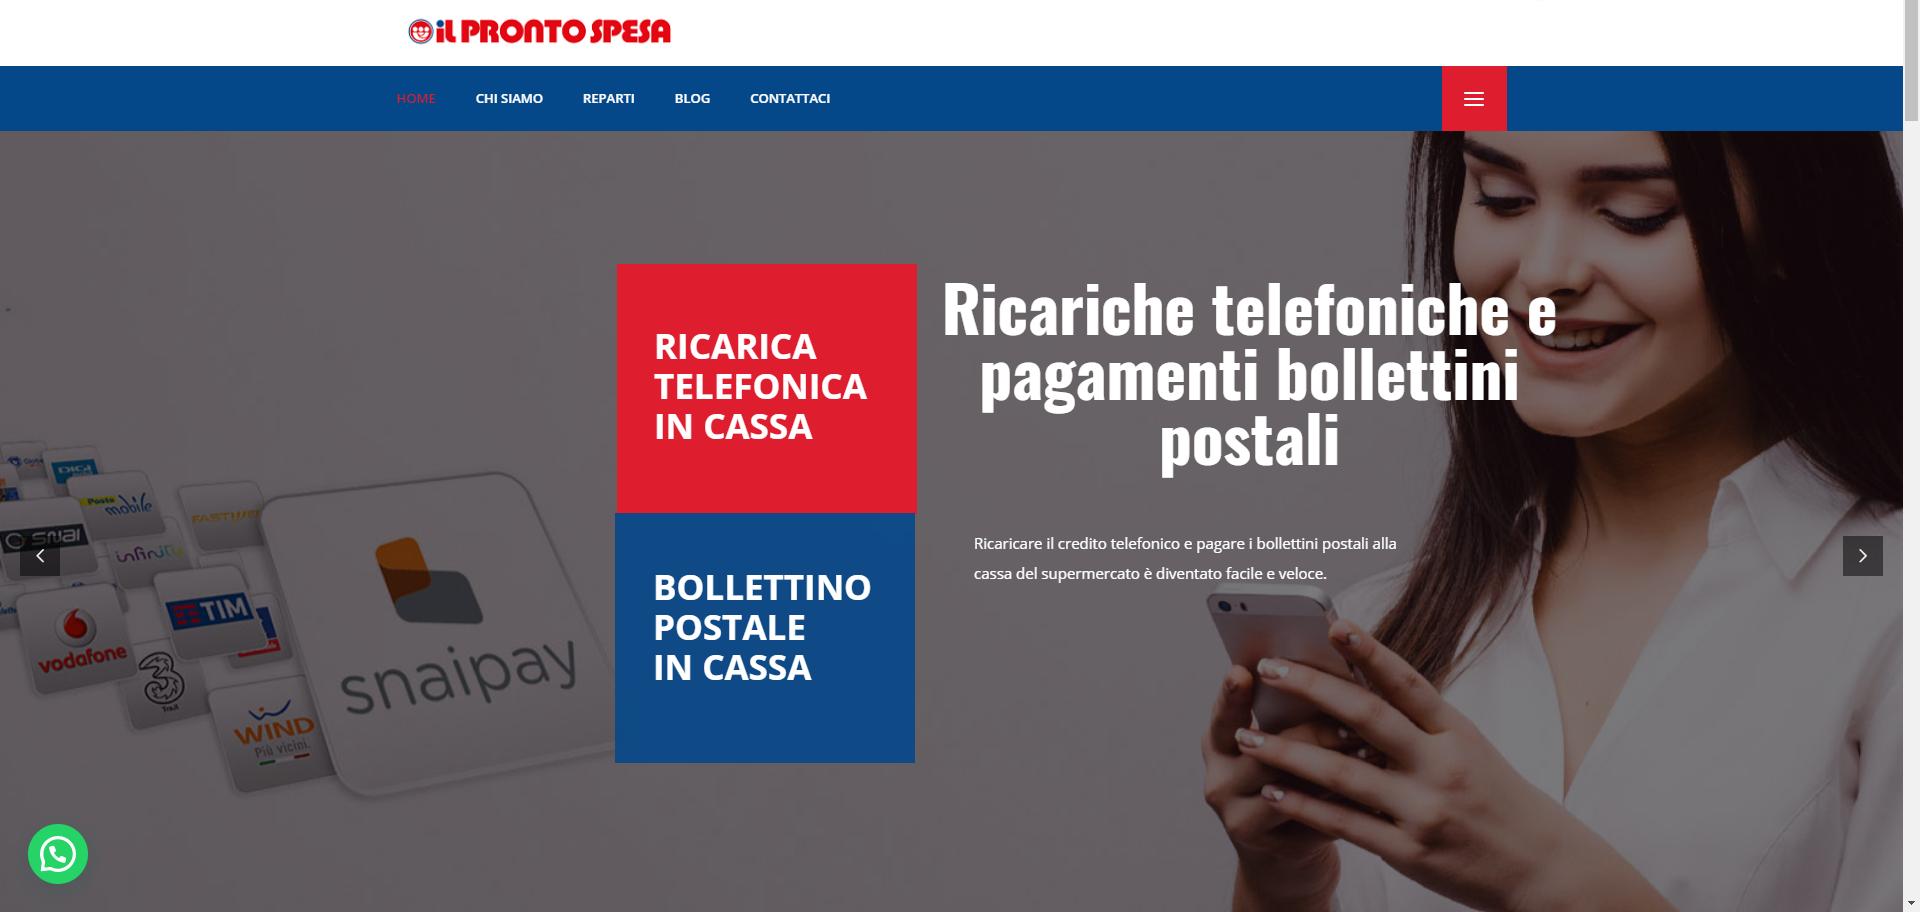 Home - Il Pronto Spesa - Google Chrome 16_04_2021 20_27_40